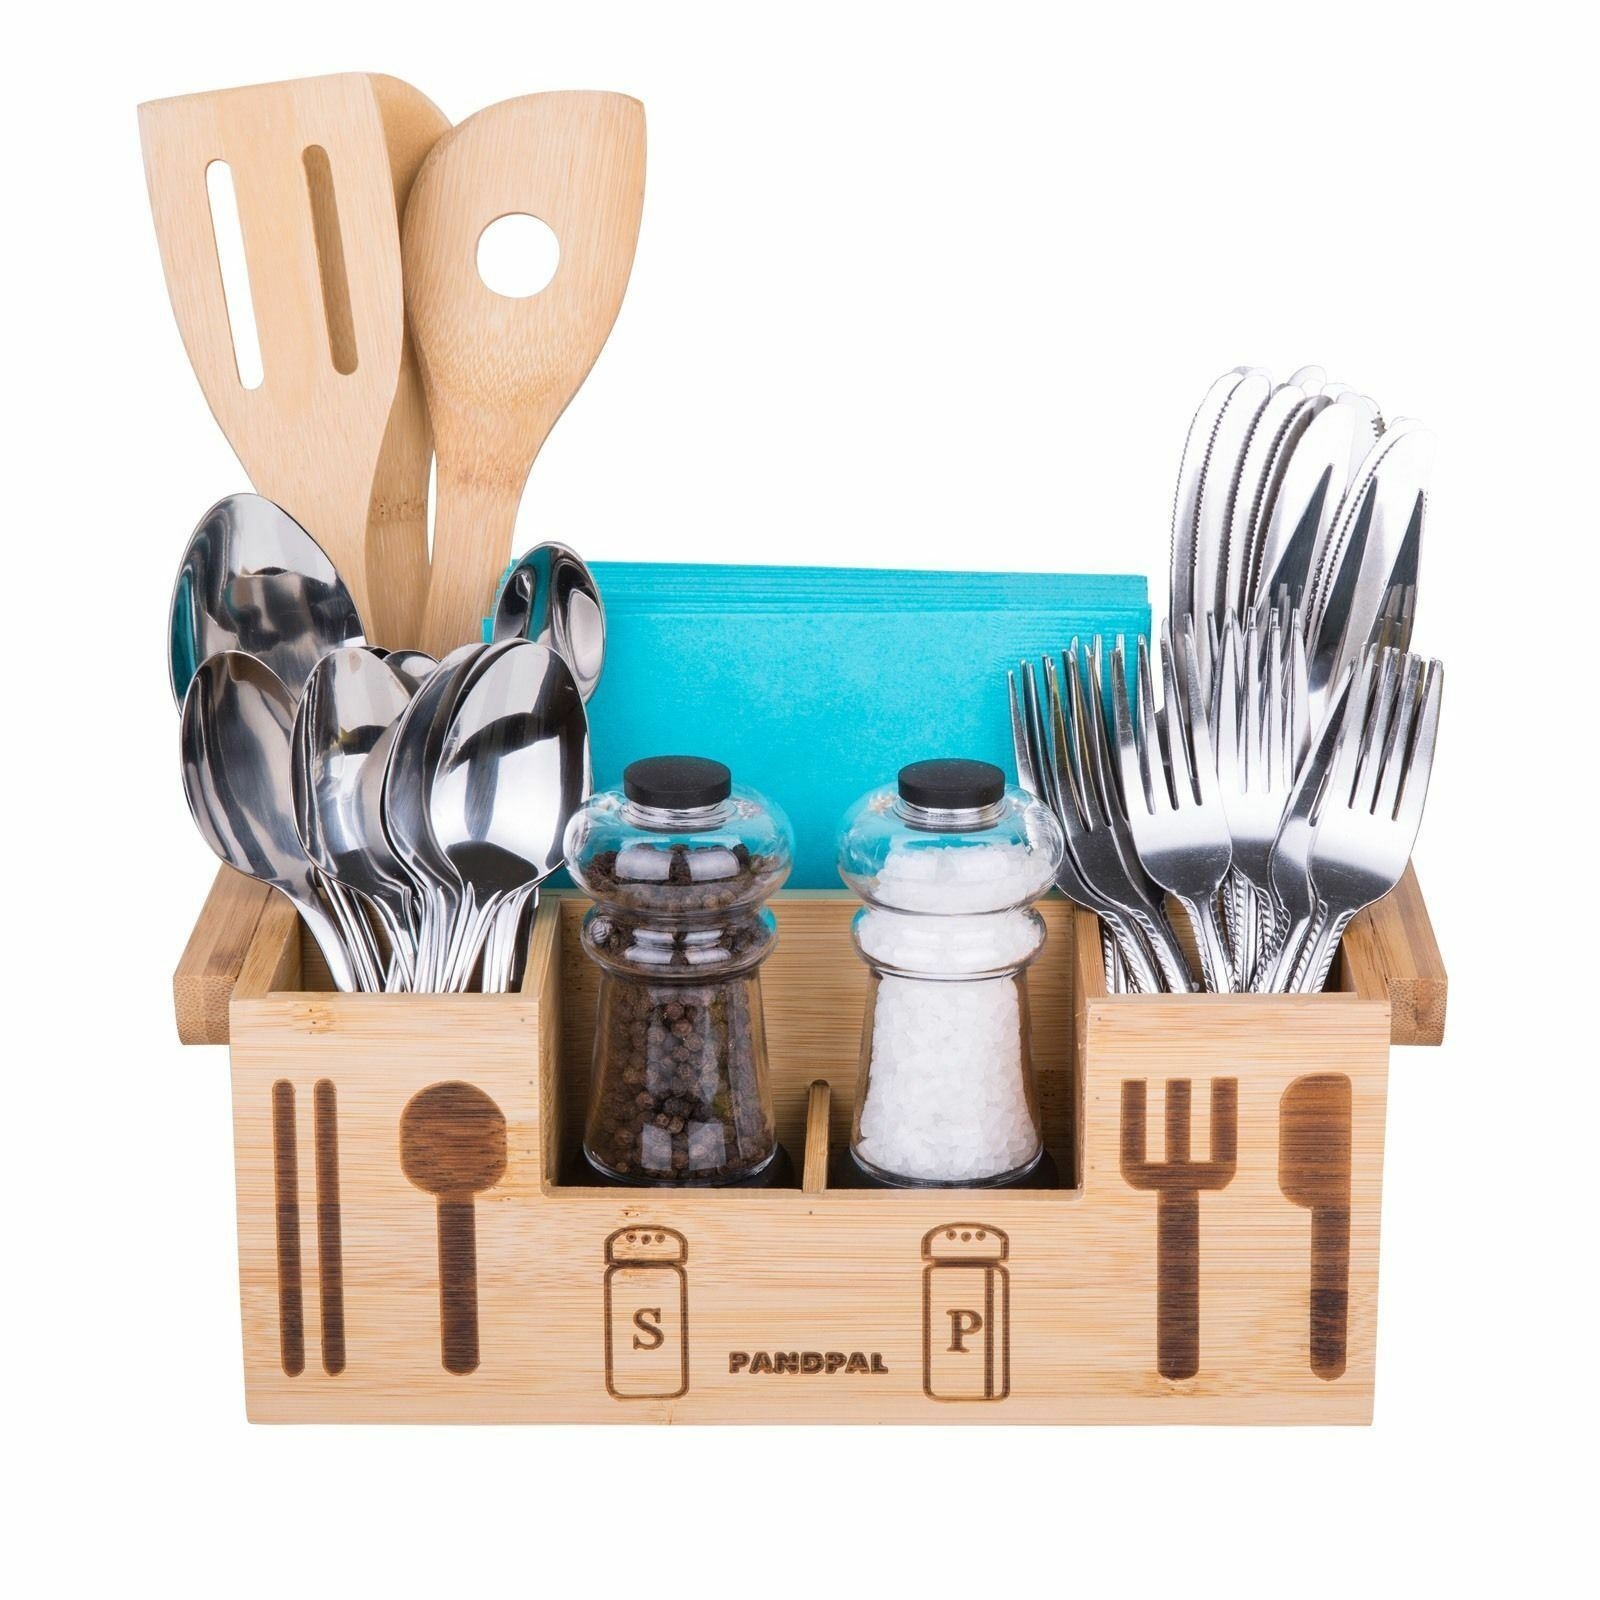 Bamboo Wooden Utensil Caddy Flatware Holder for Spoons Knives Forks ...